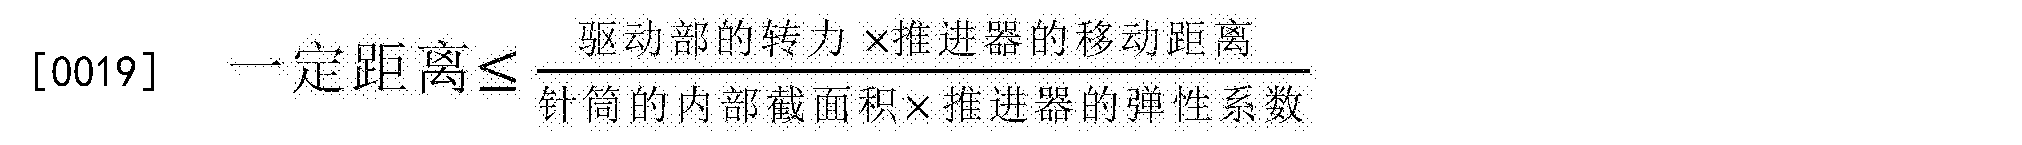 Figure CN105848696AD00042